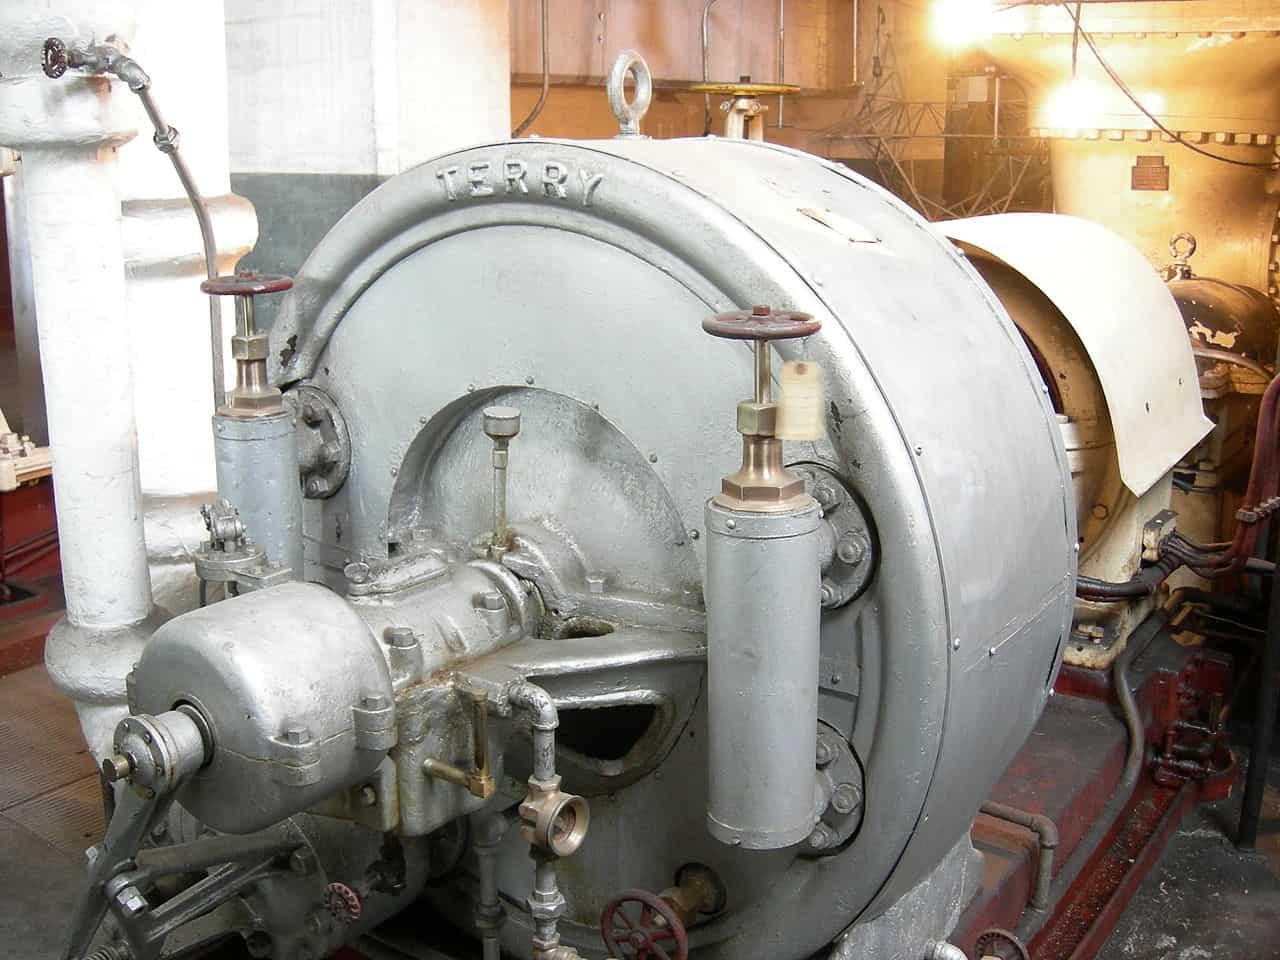 Westinghouse Steam Turbine via Joe Mabel on Wikimedia